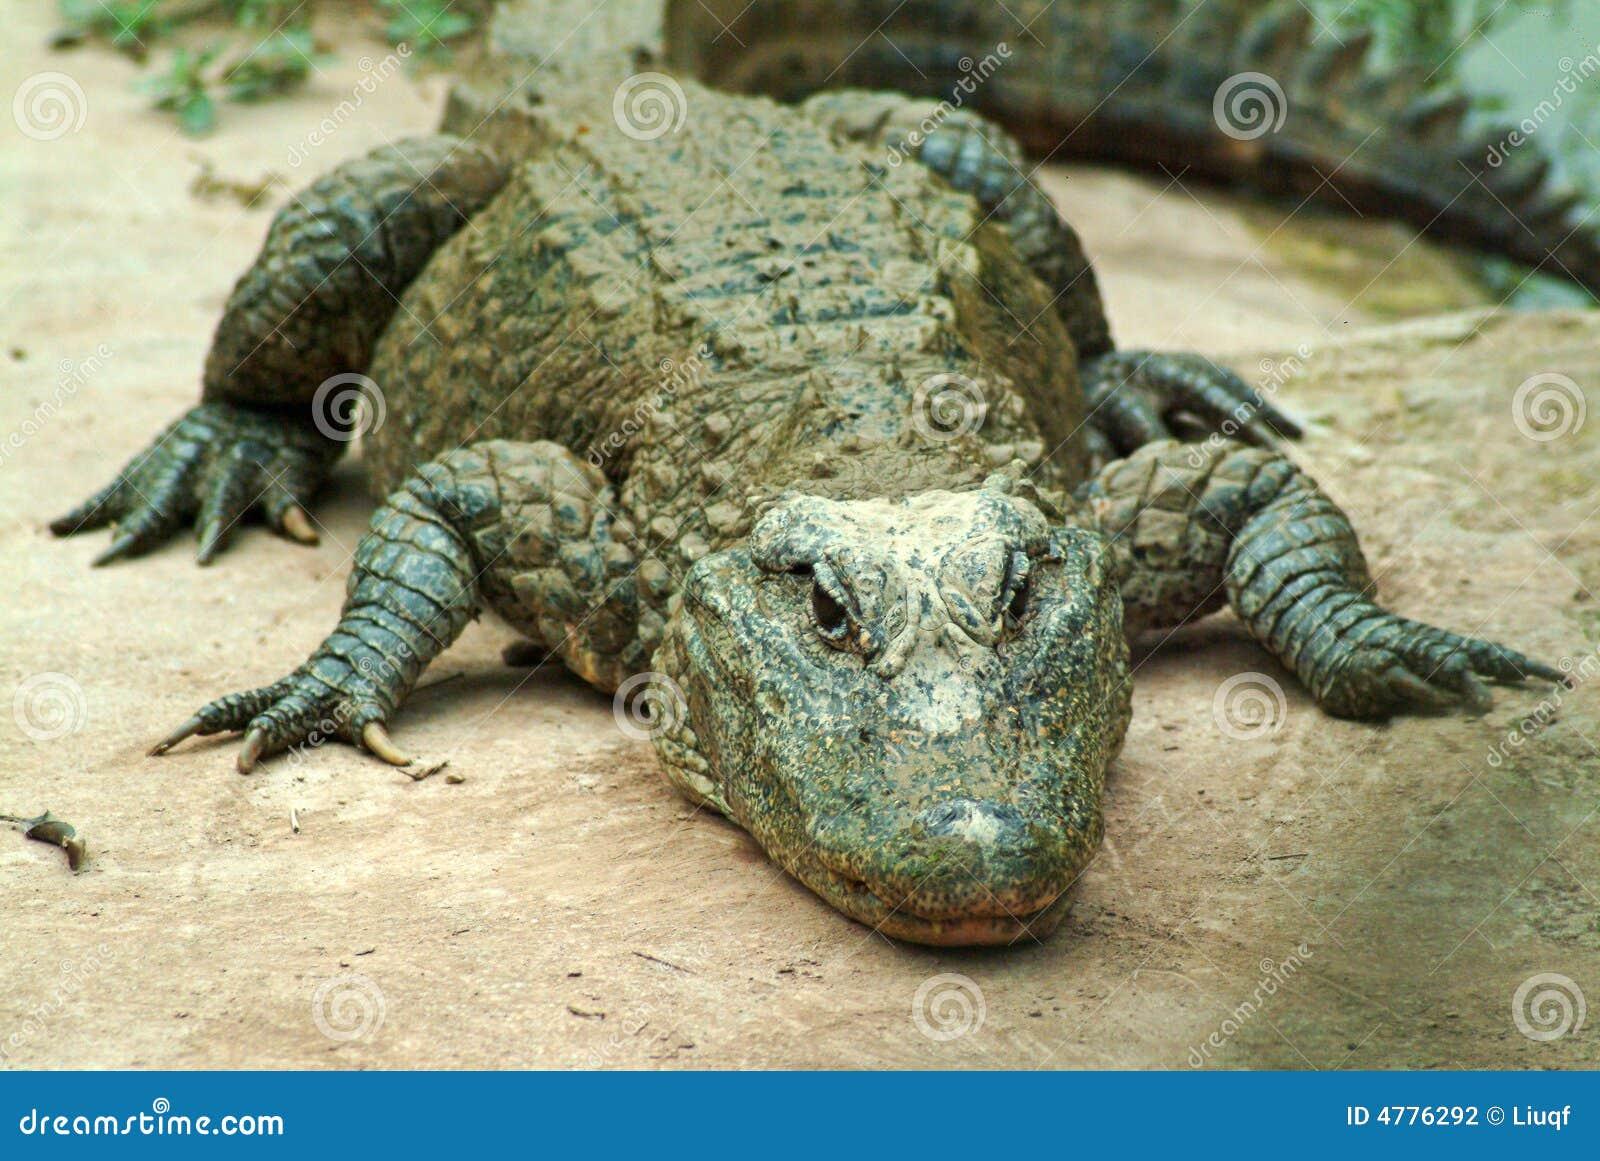 Sinensis del cocodrilo